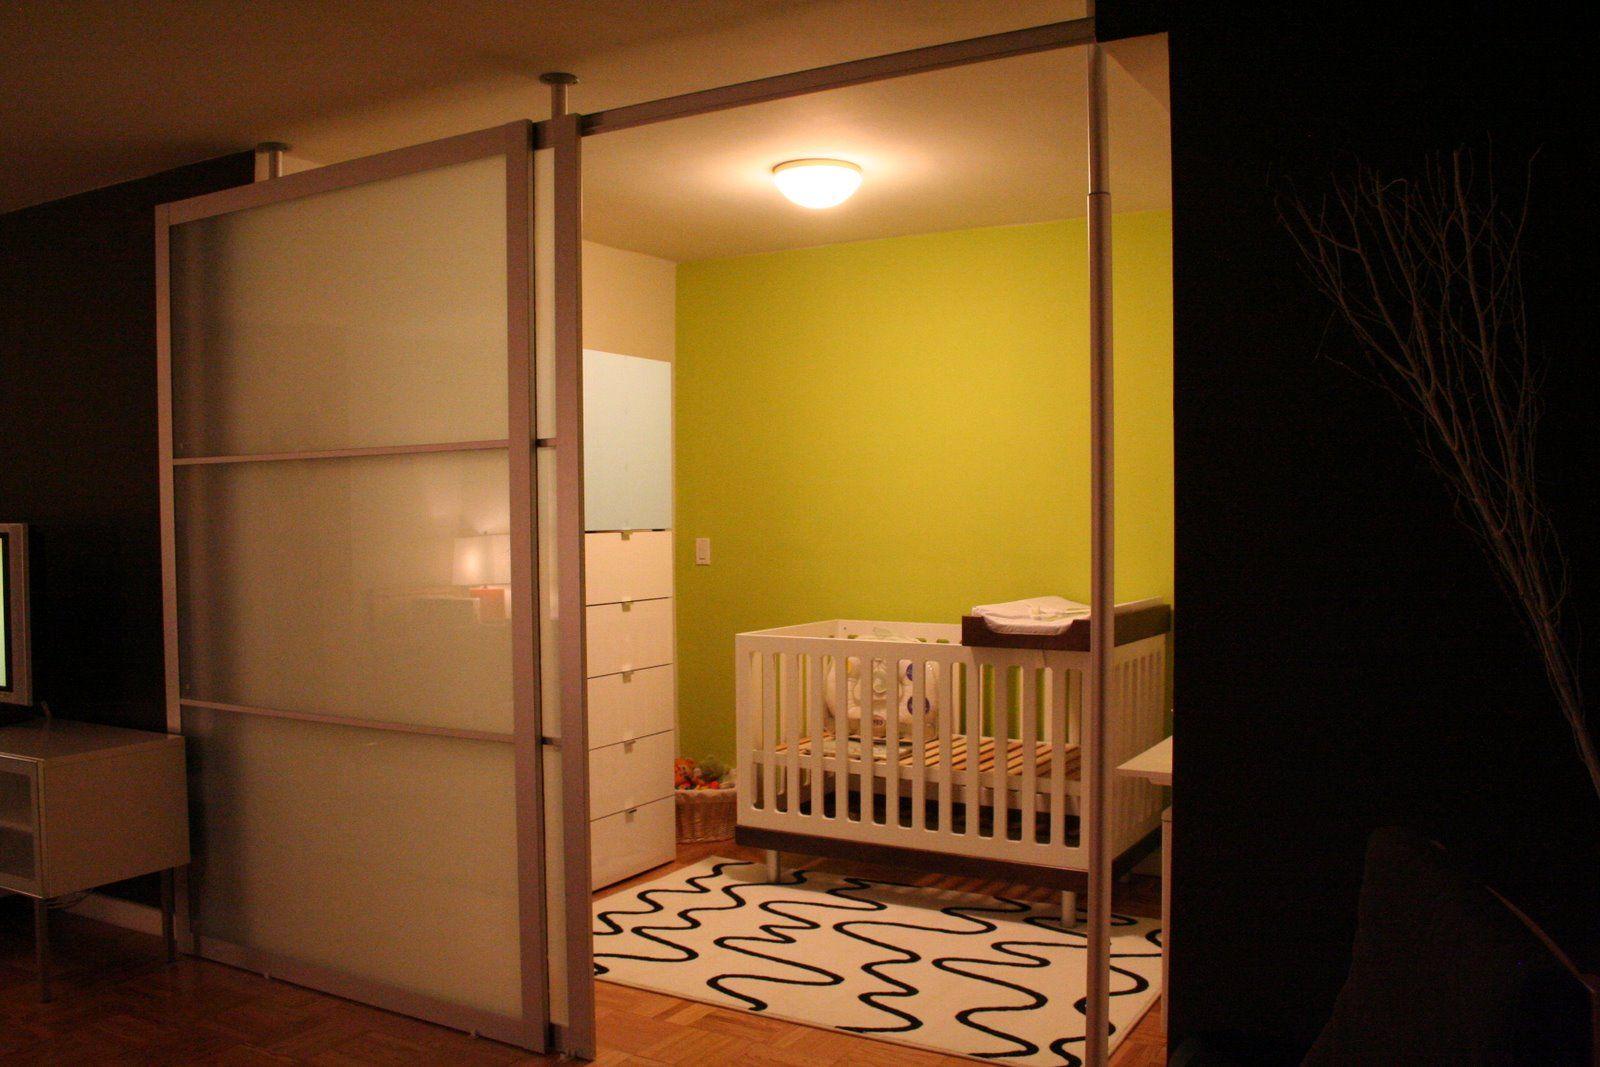 Room divider using Stolman Poles and Ikea Sliding Doors